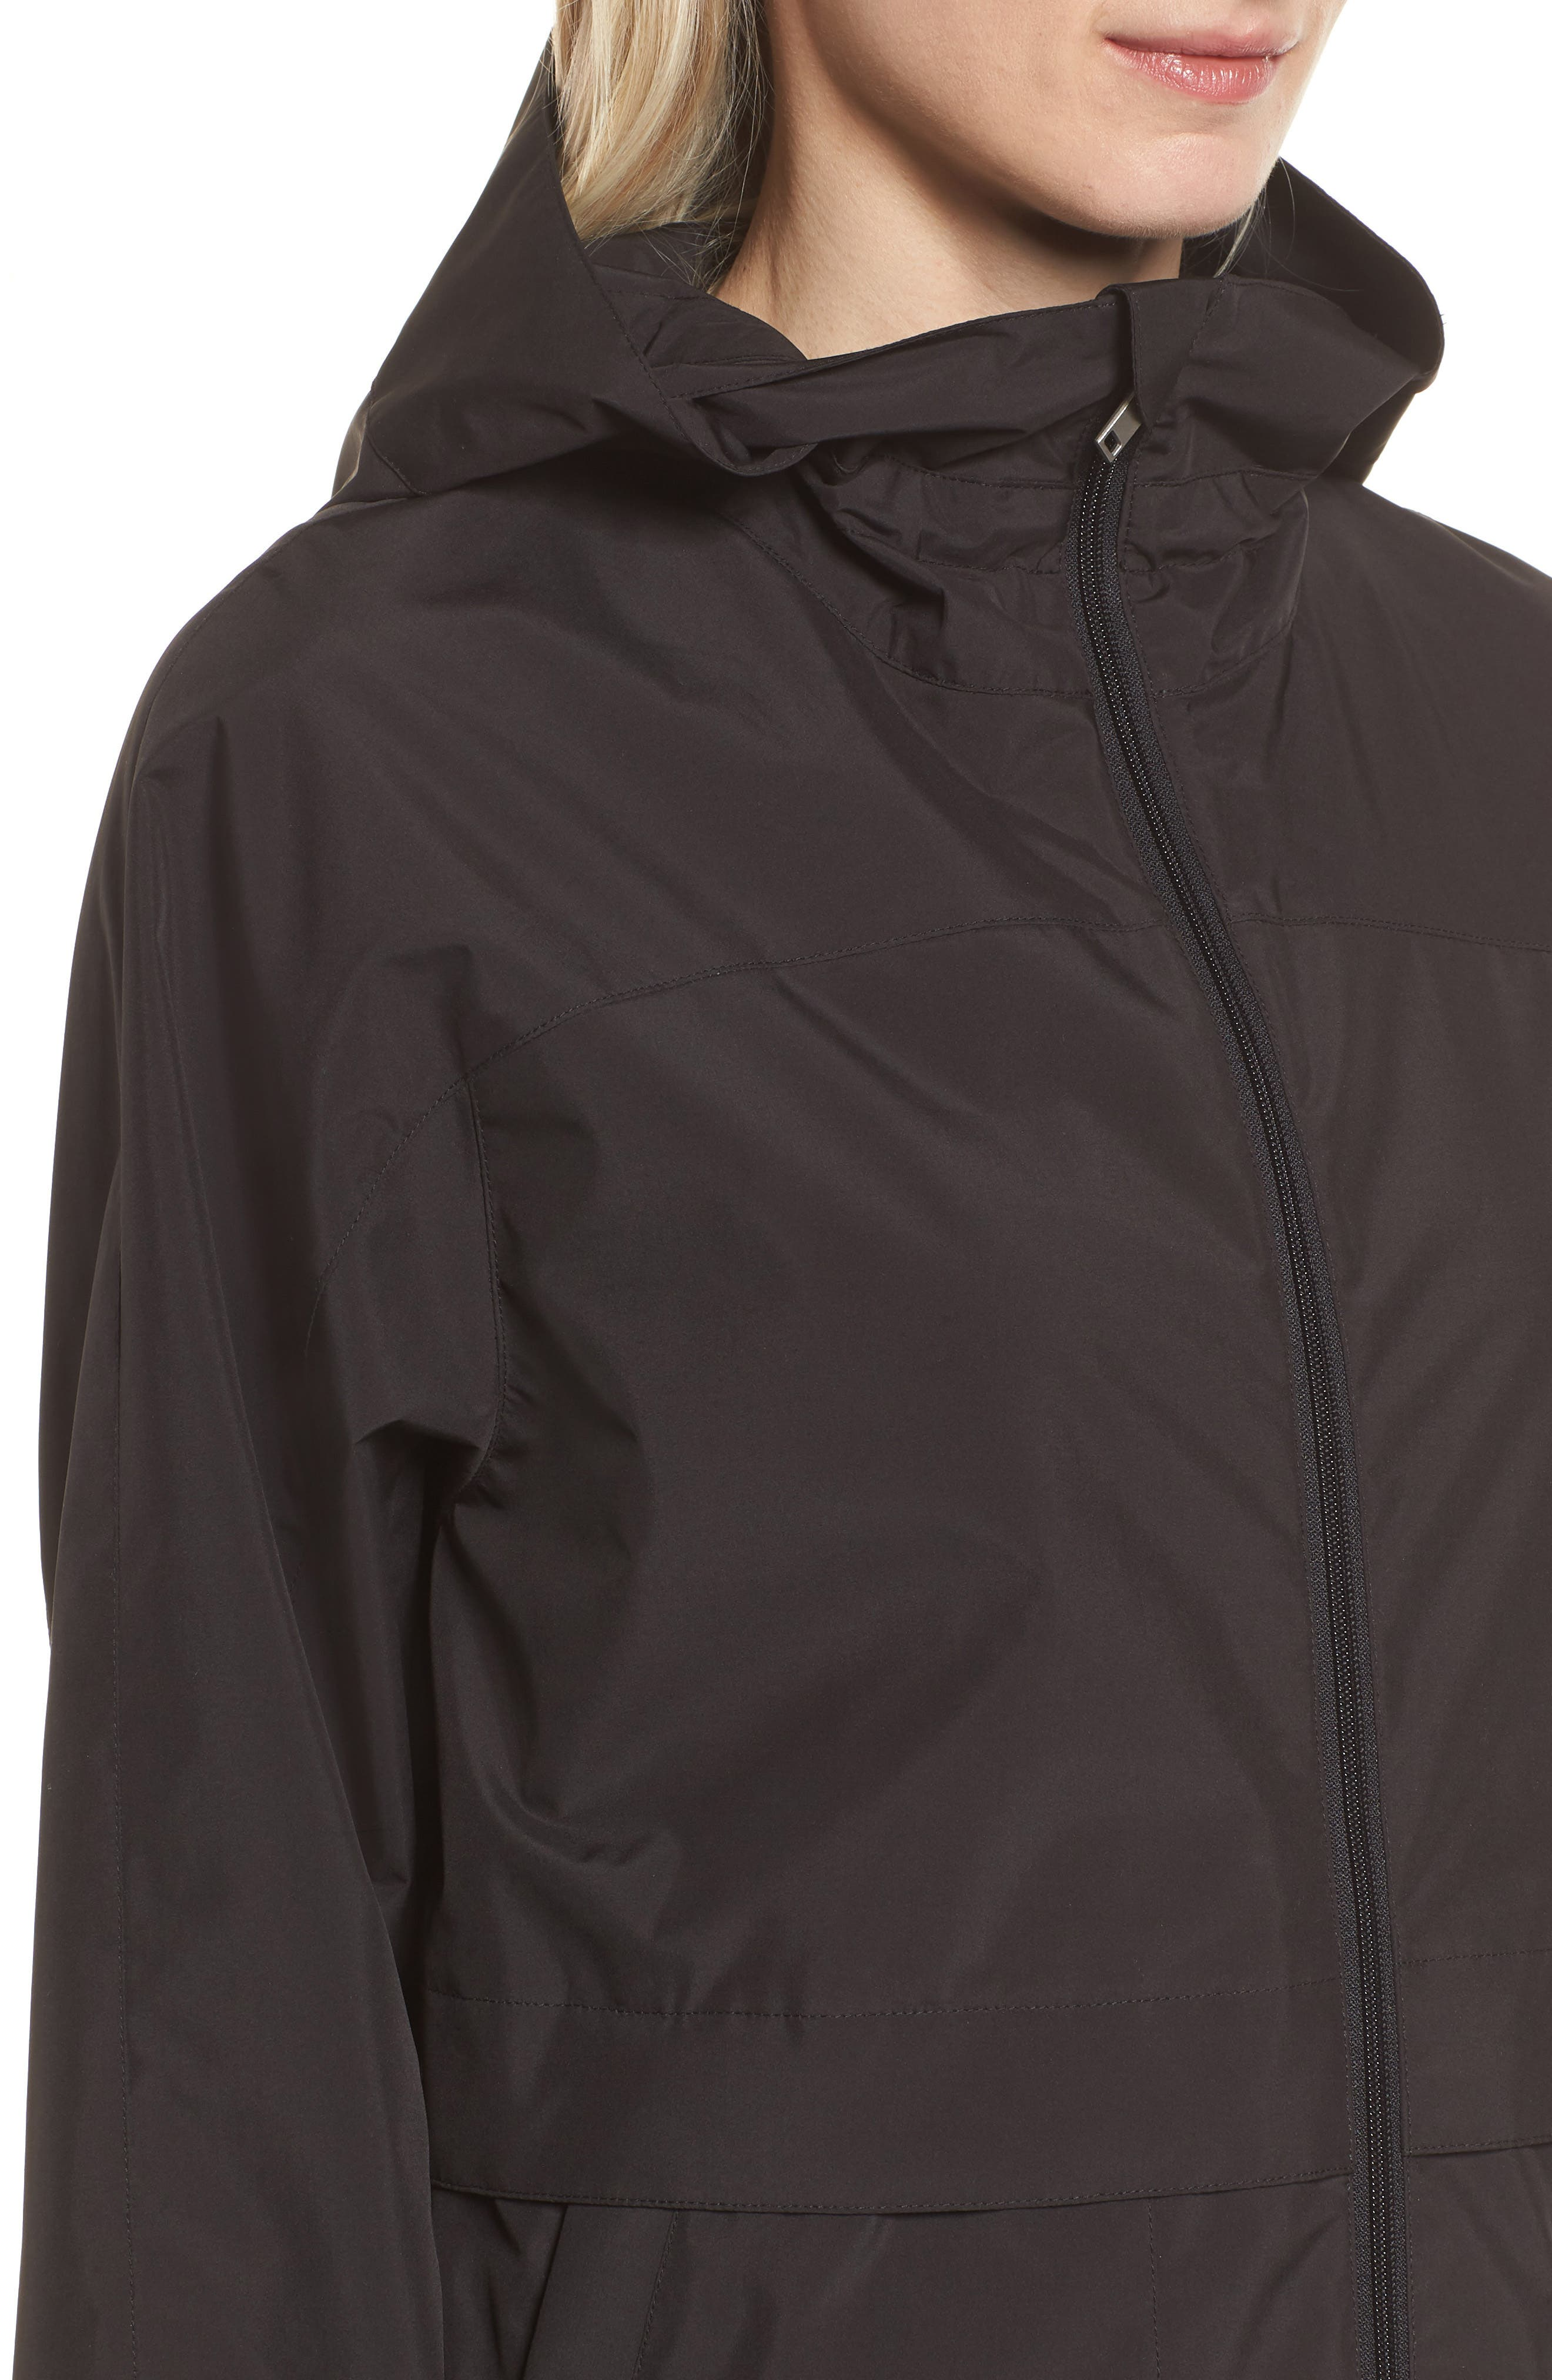 Pearl Cloth Hooded Jacket,                             Alternate thumbnail 8, color,